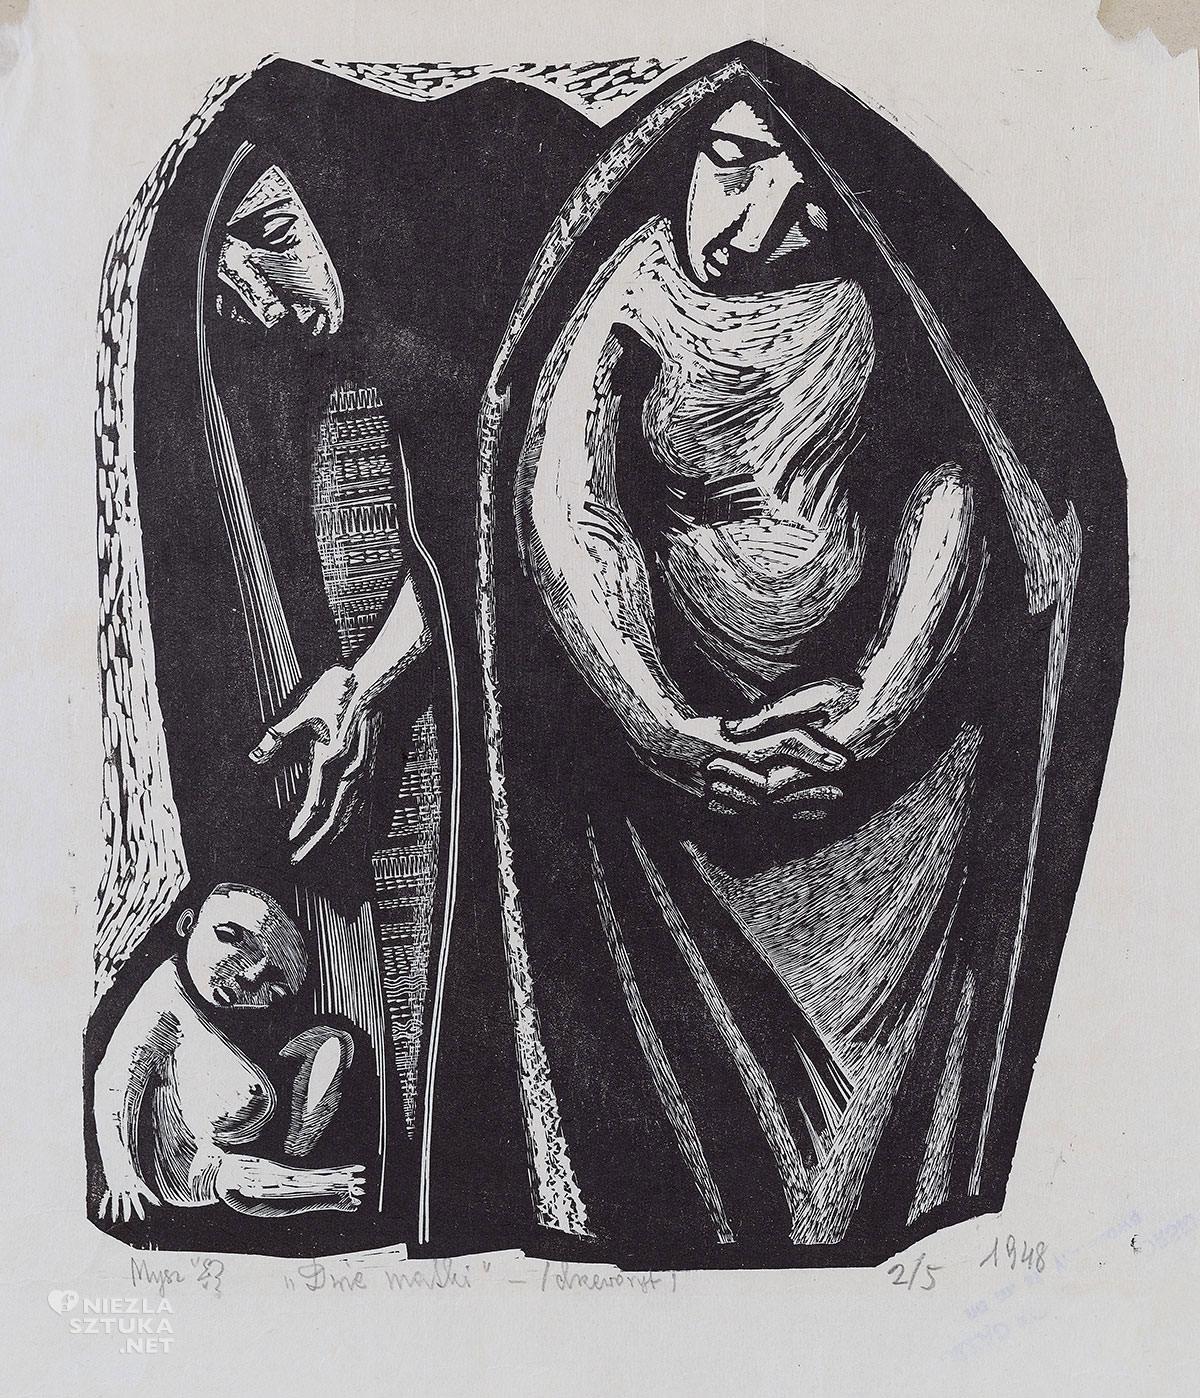 Maria Hiszpańska-Neumann, matka, drzeworyt, ilustracja, grafika, Niezła sztuka